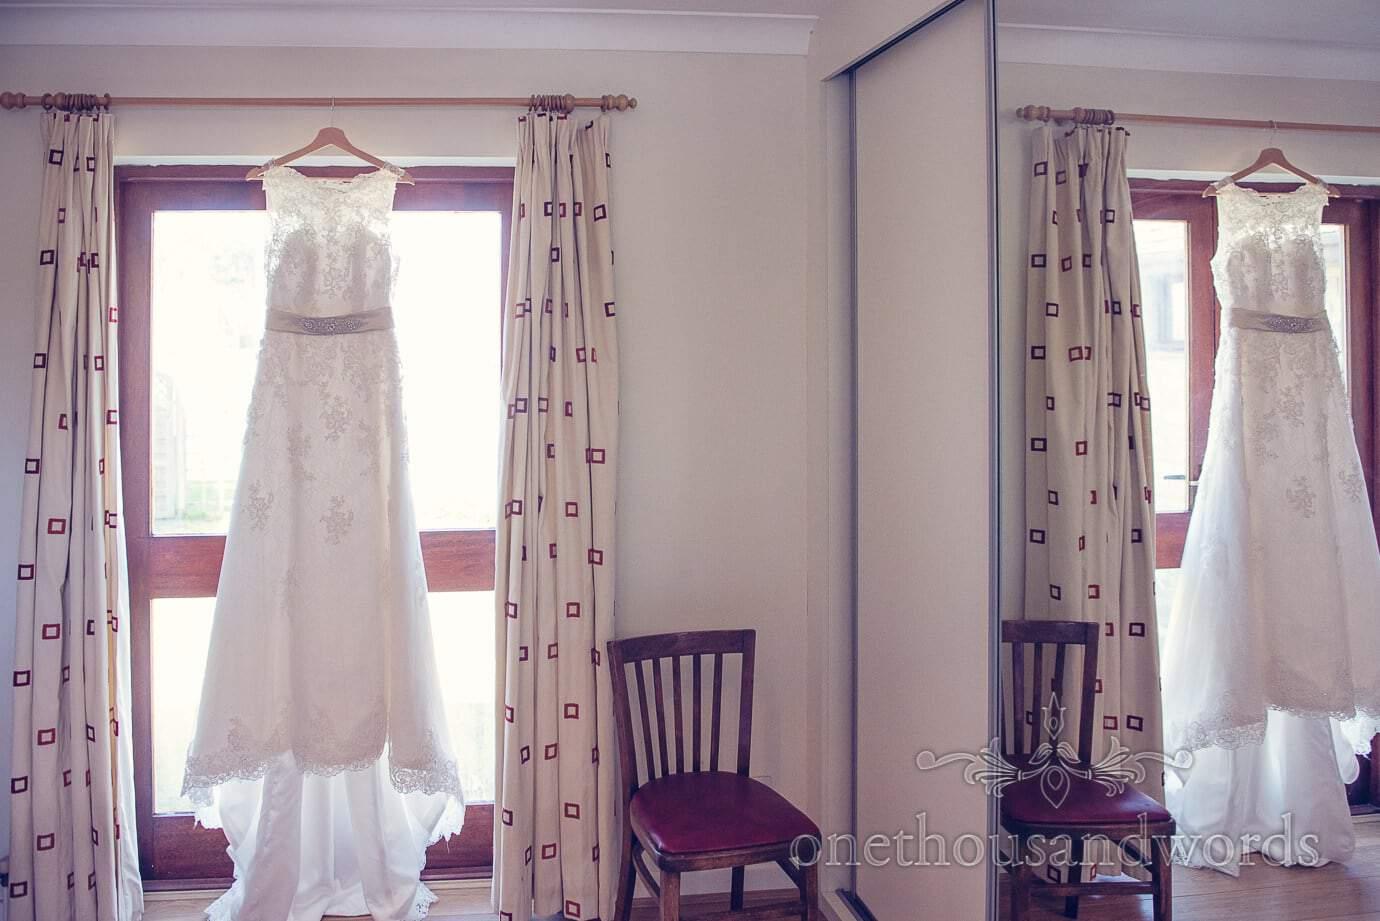 Wedding dress hangs in bedroom window and mirror on wedding morning